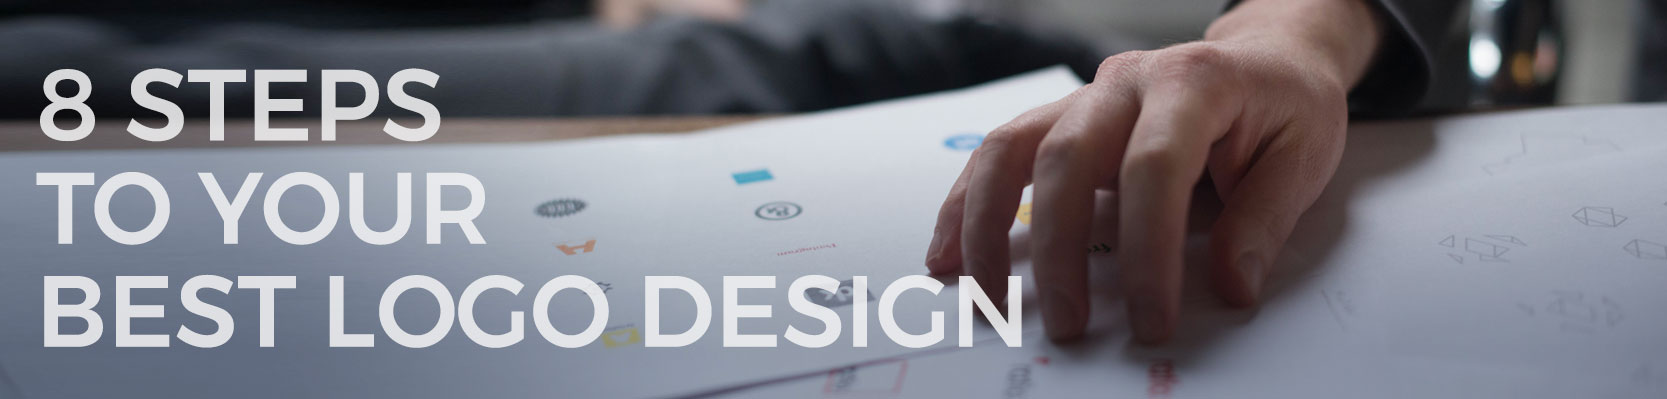 The best logo design process